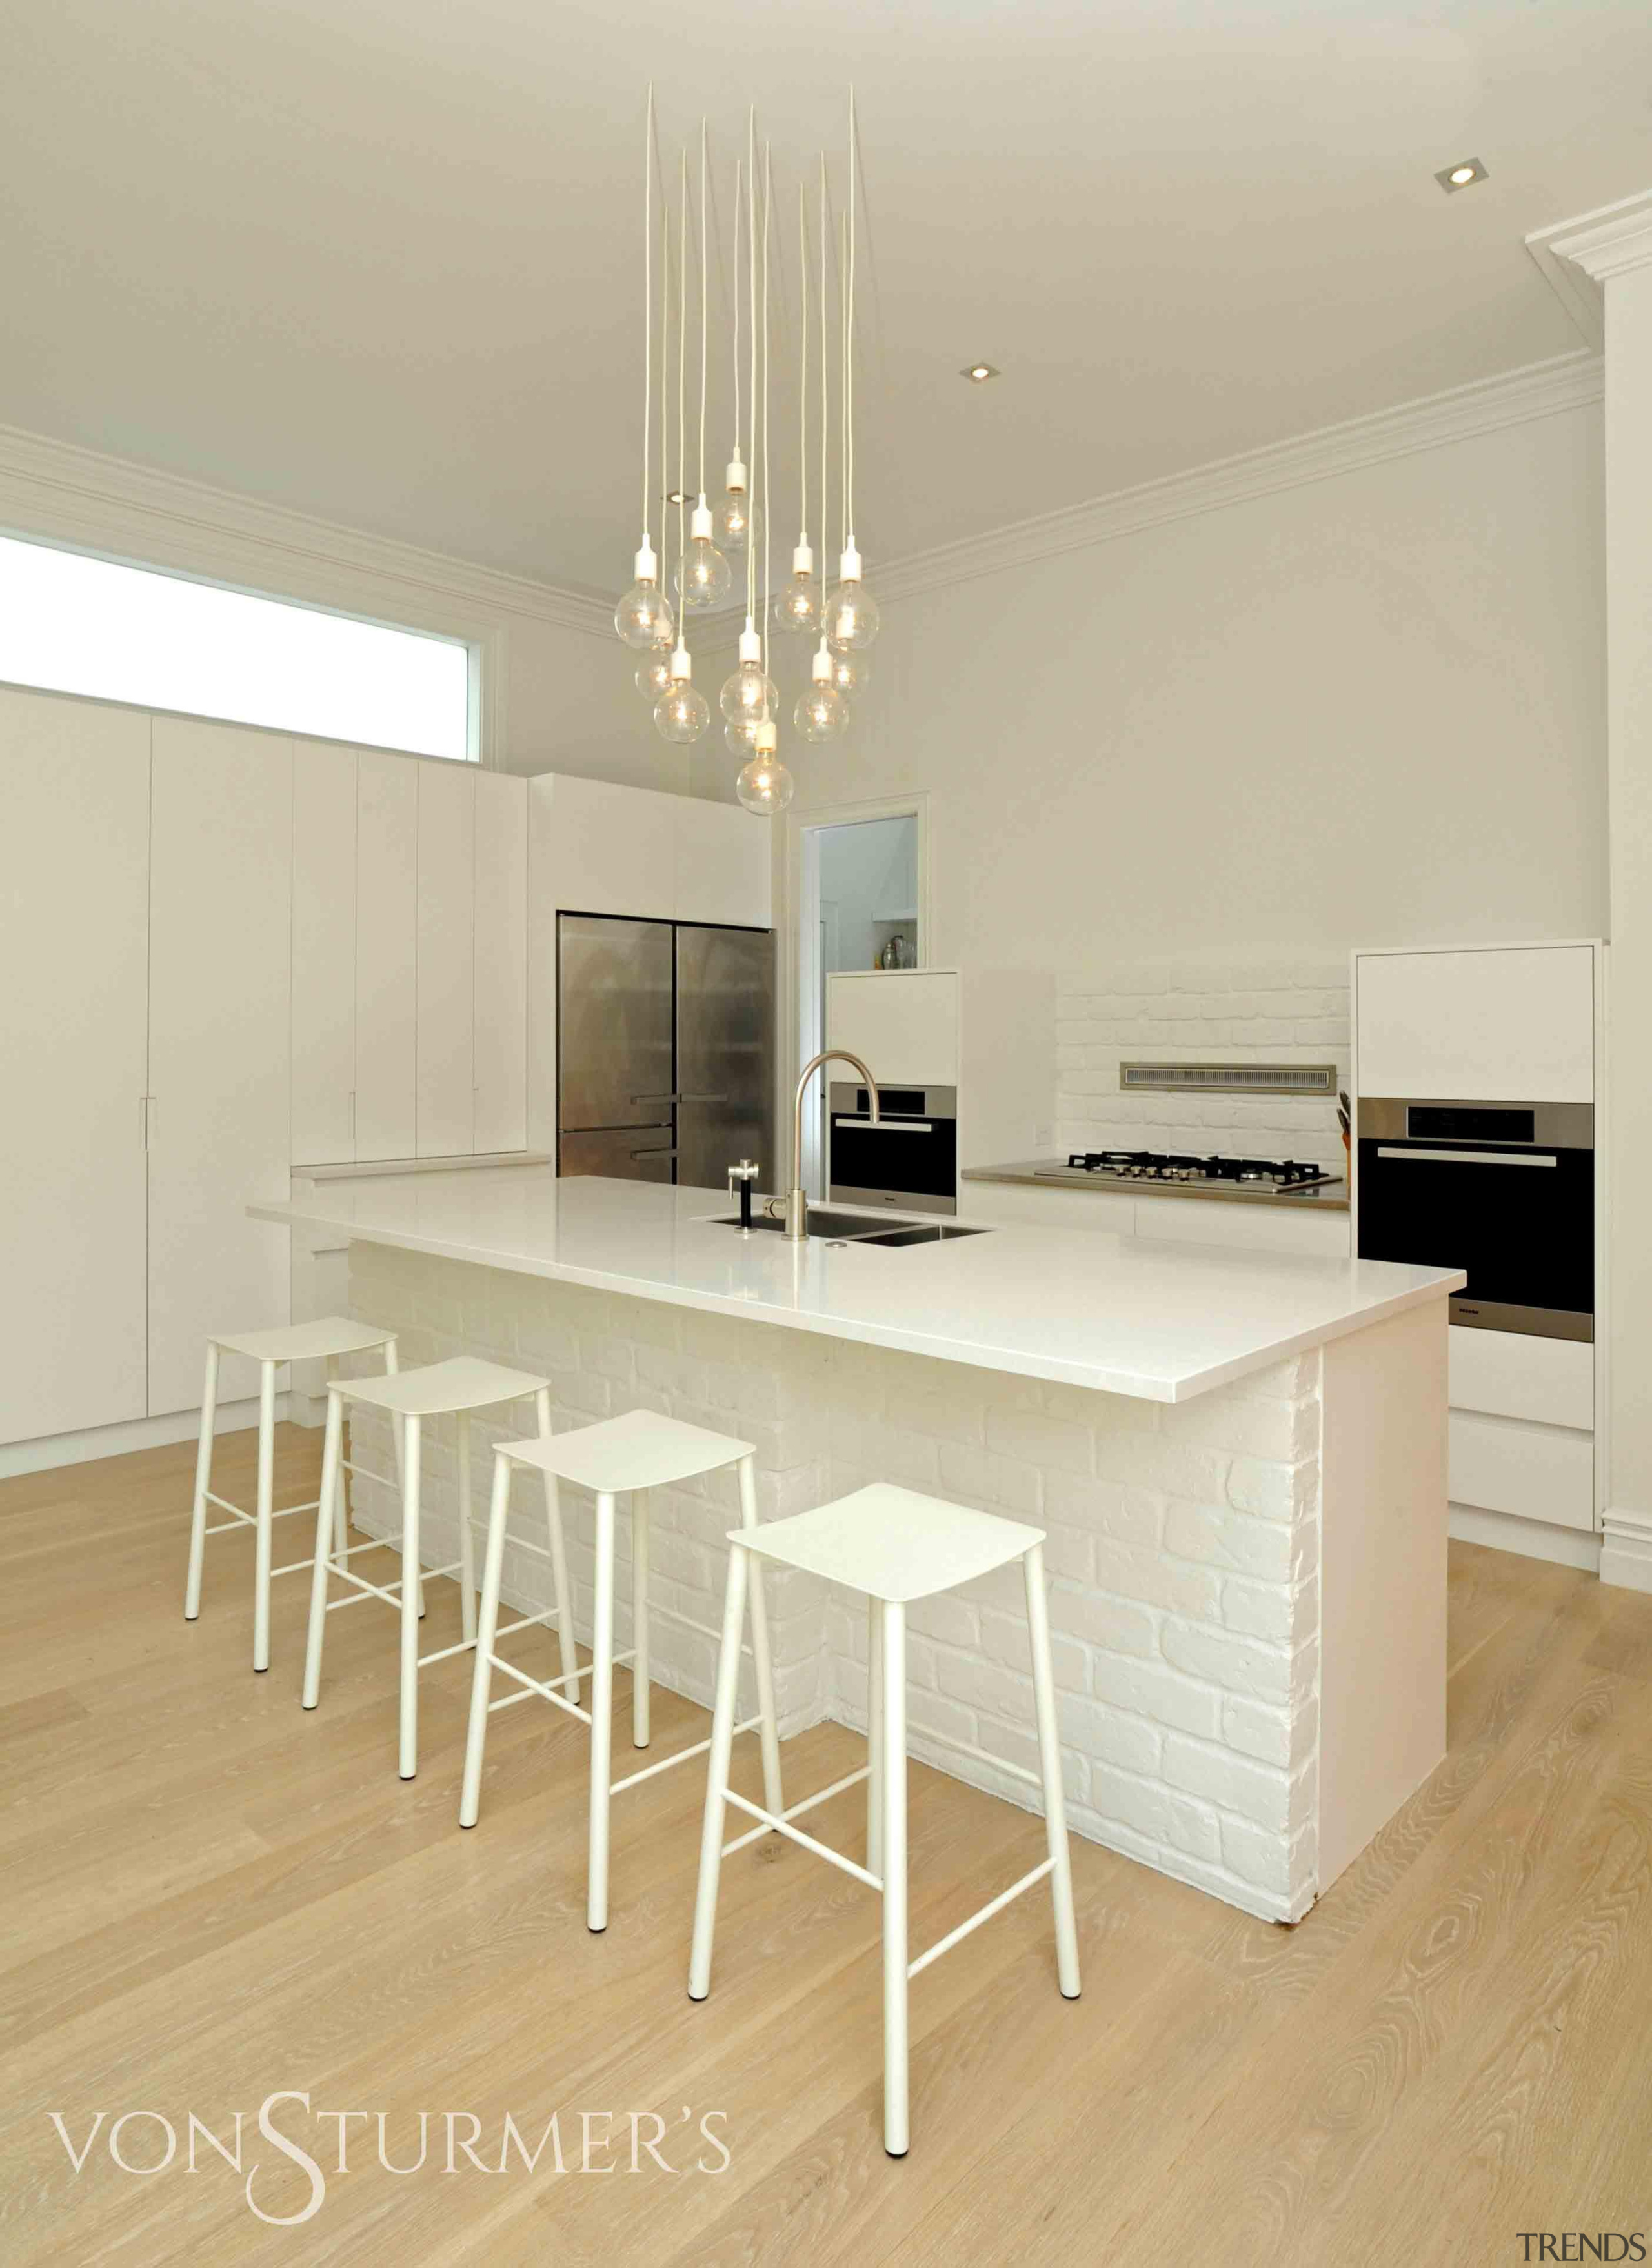 Herne Bay Villa - Herne Bay Villa - floor, flooring, furniture, interior design, kitchen, product design, table, wood flooring, orange